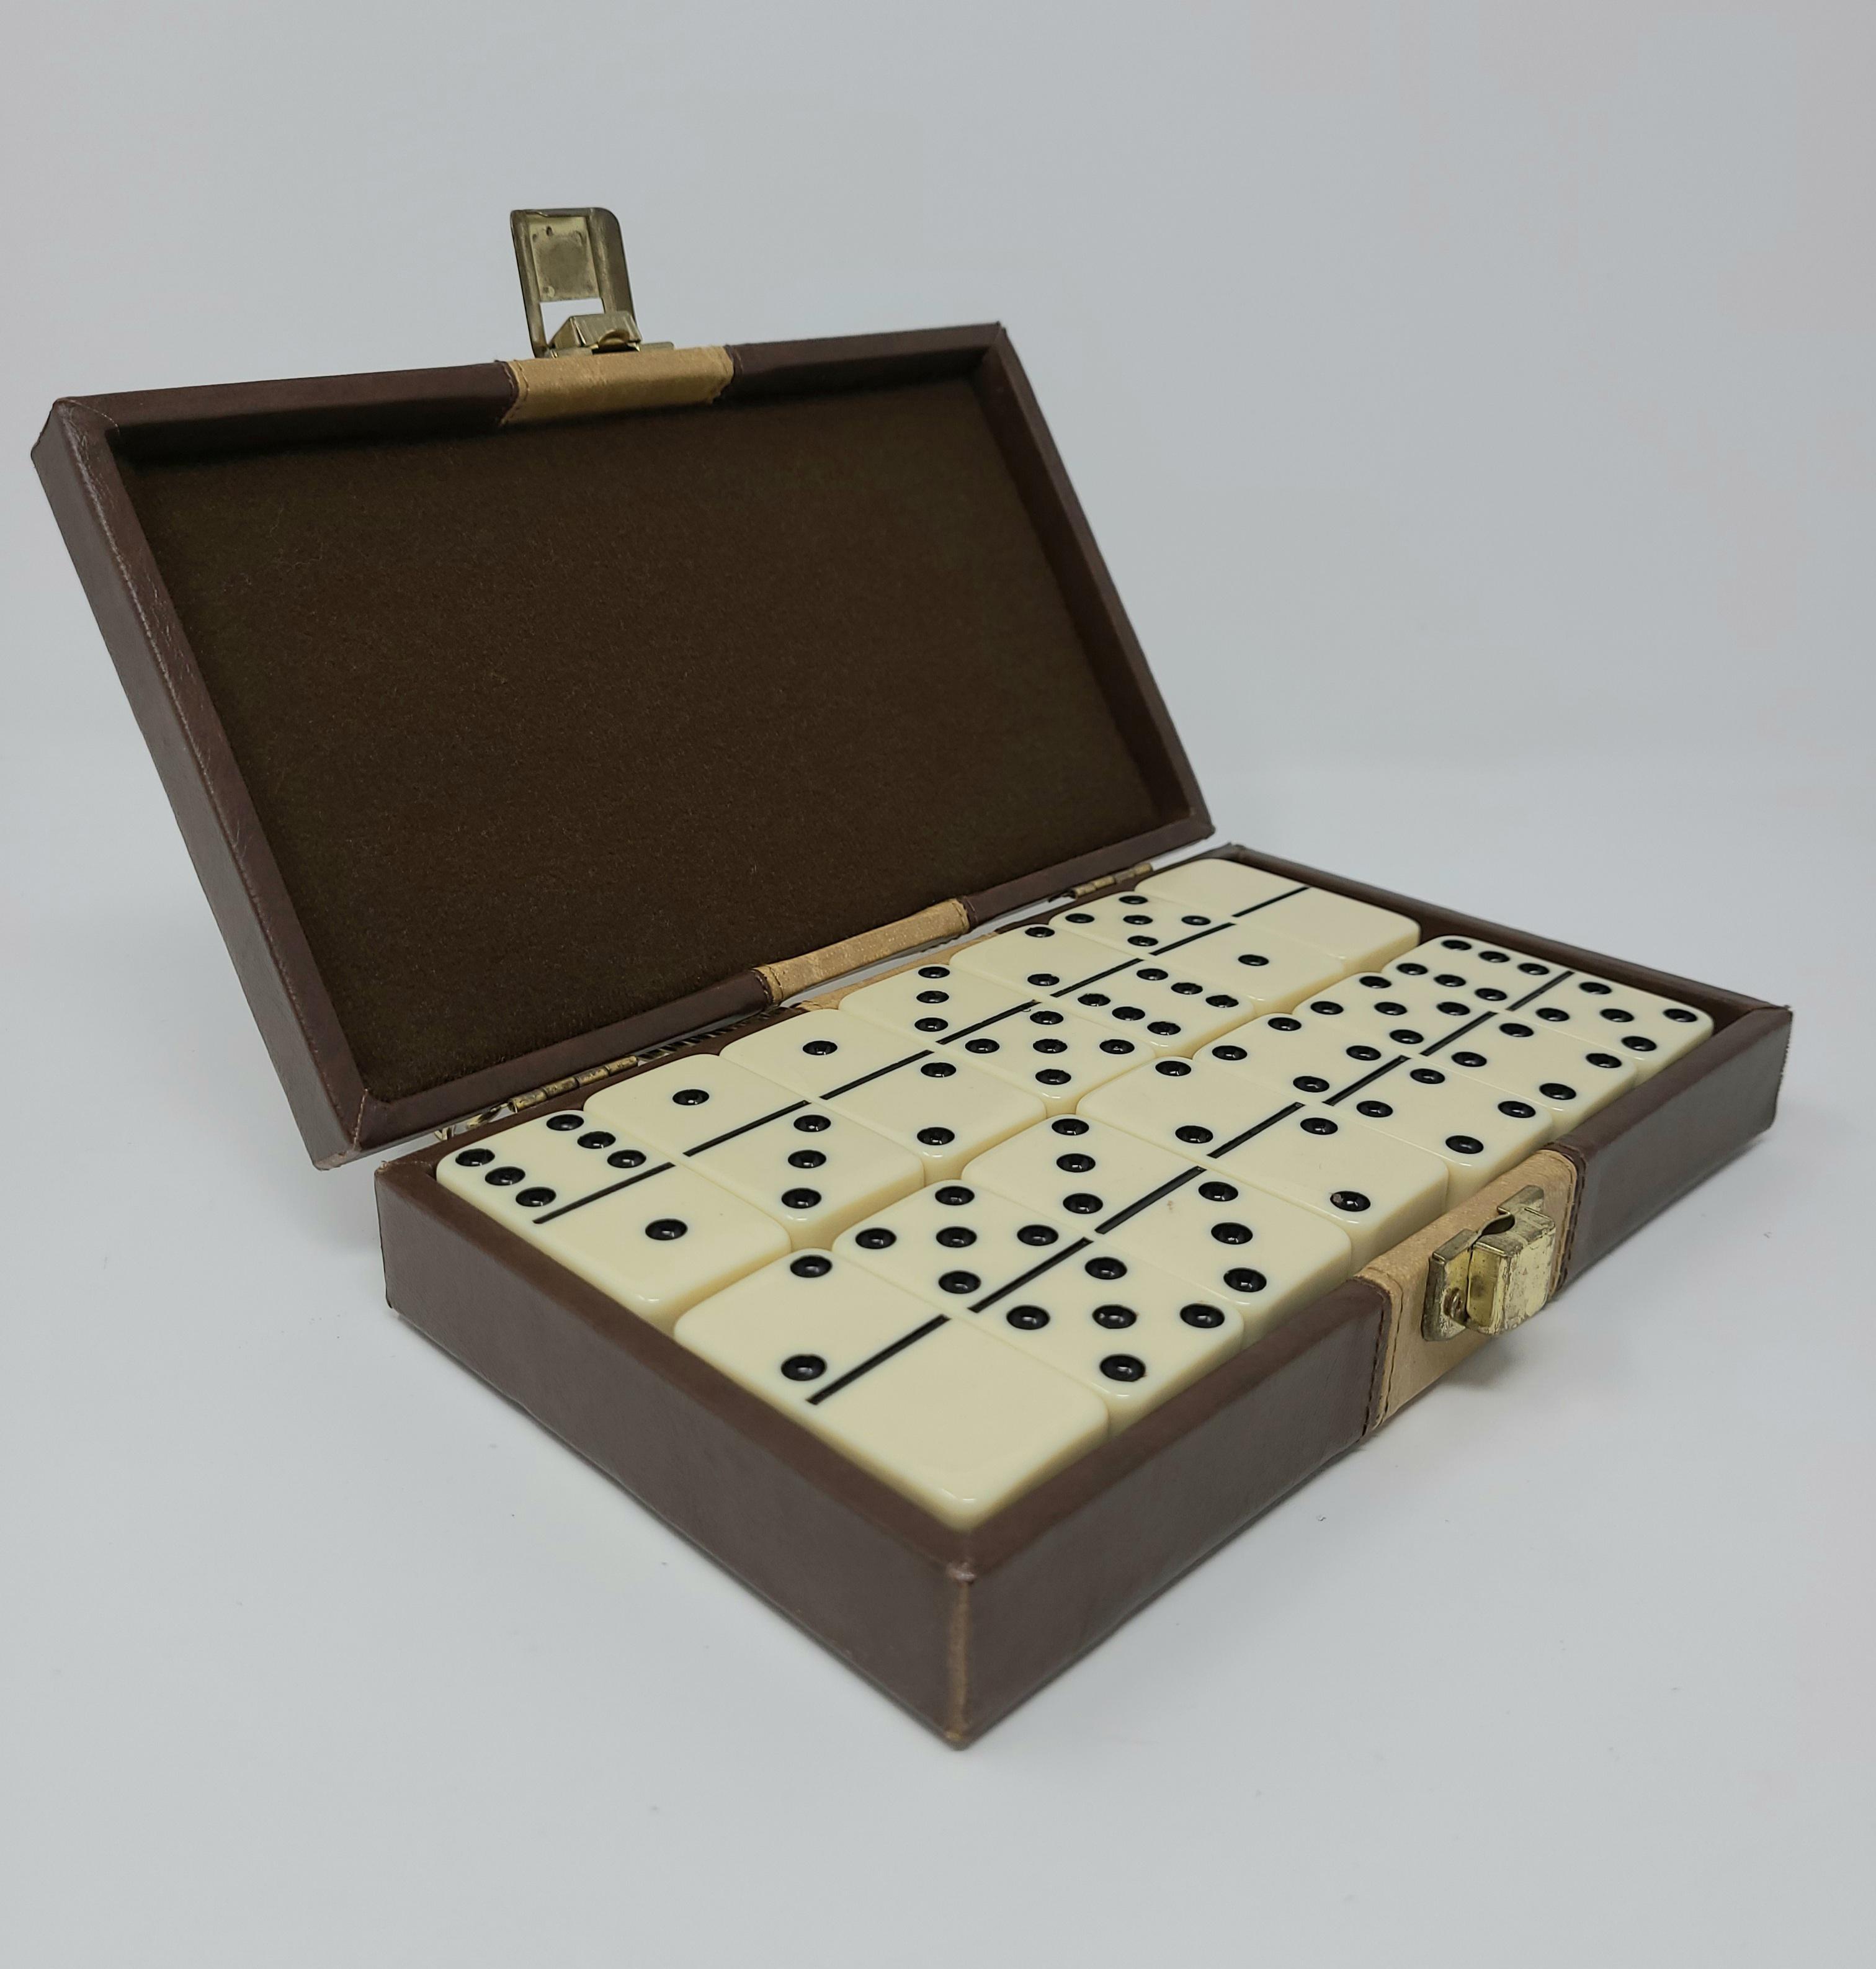 Double Six Bakelite Dominoes In Case Vintage Unopened Domino Tile Game ~ #D4103